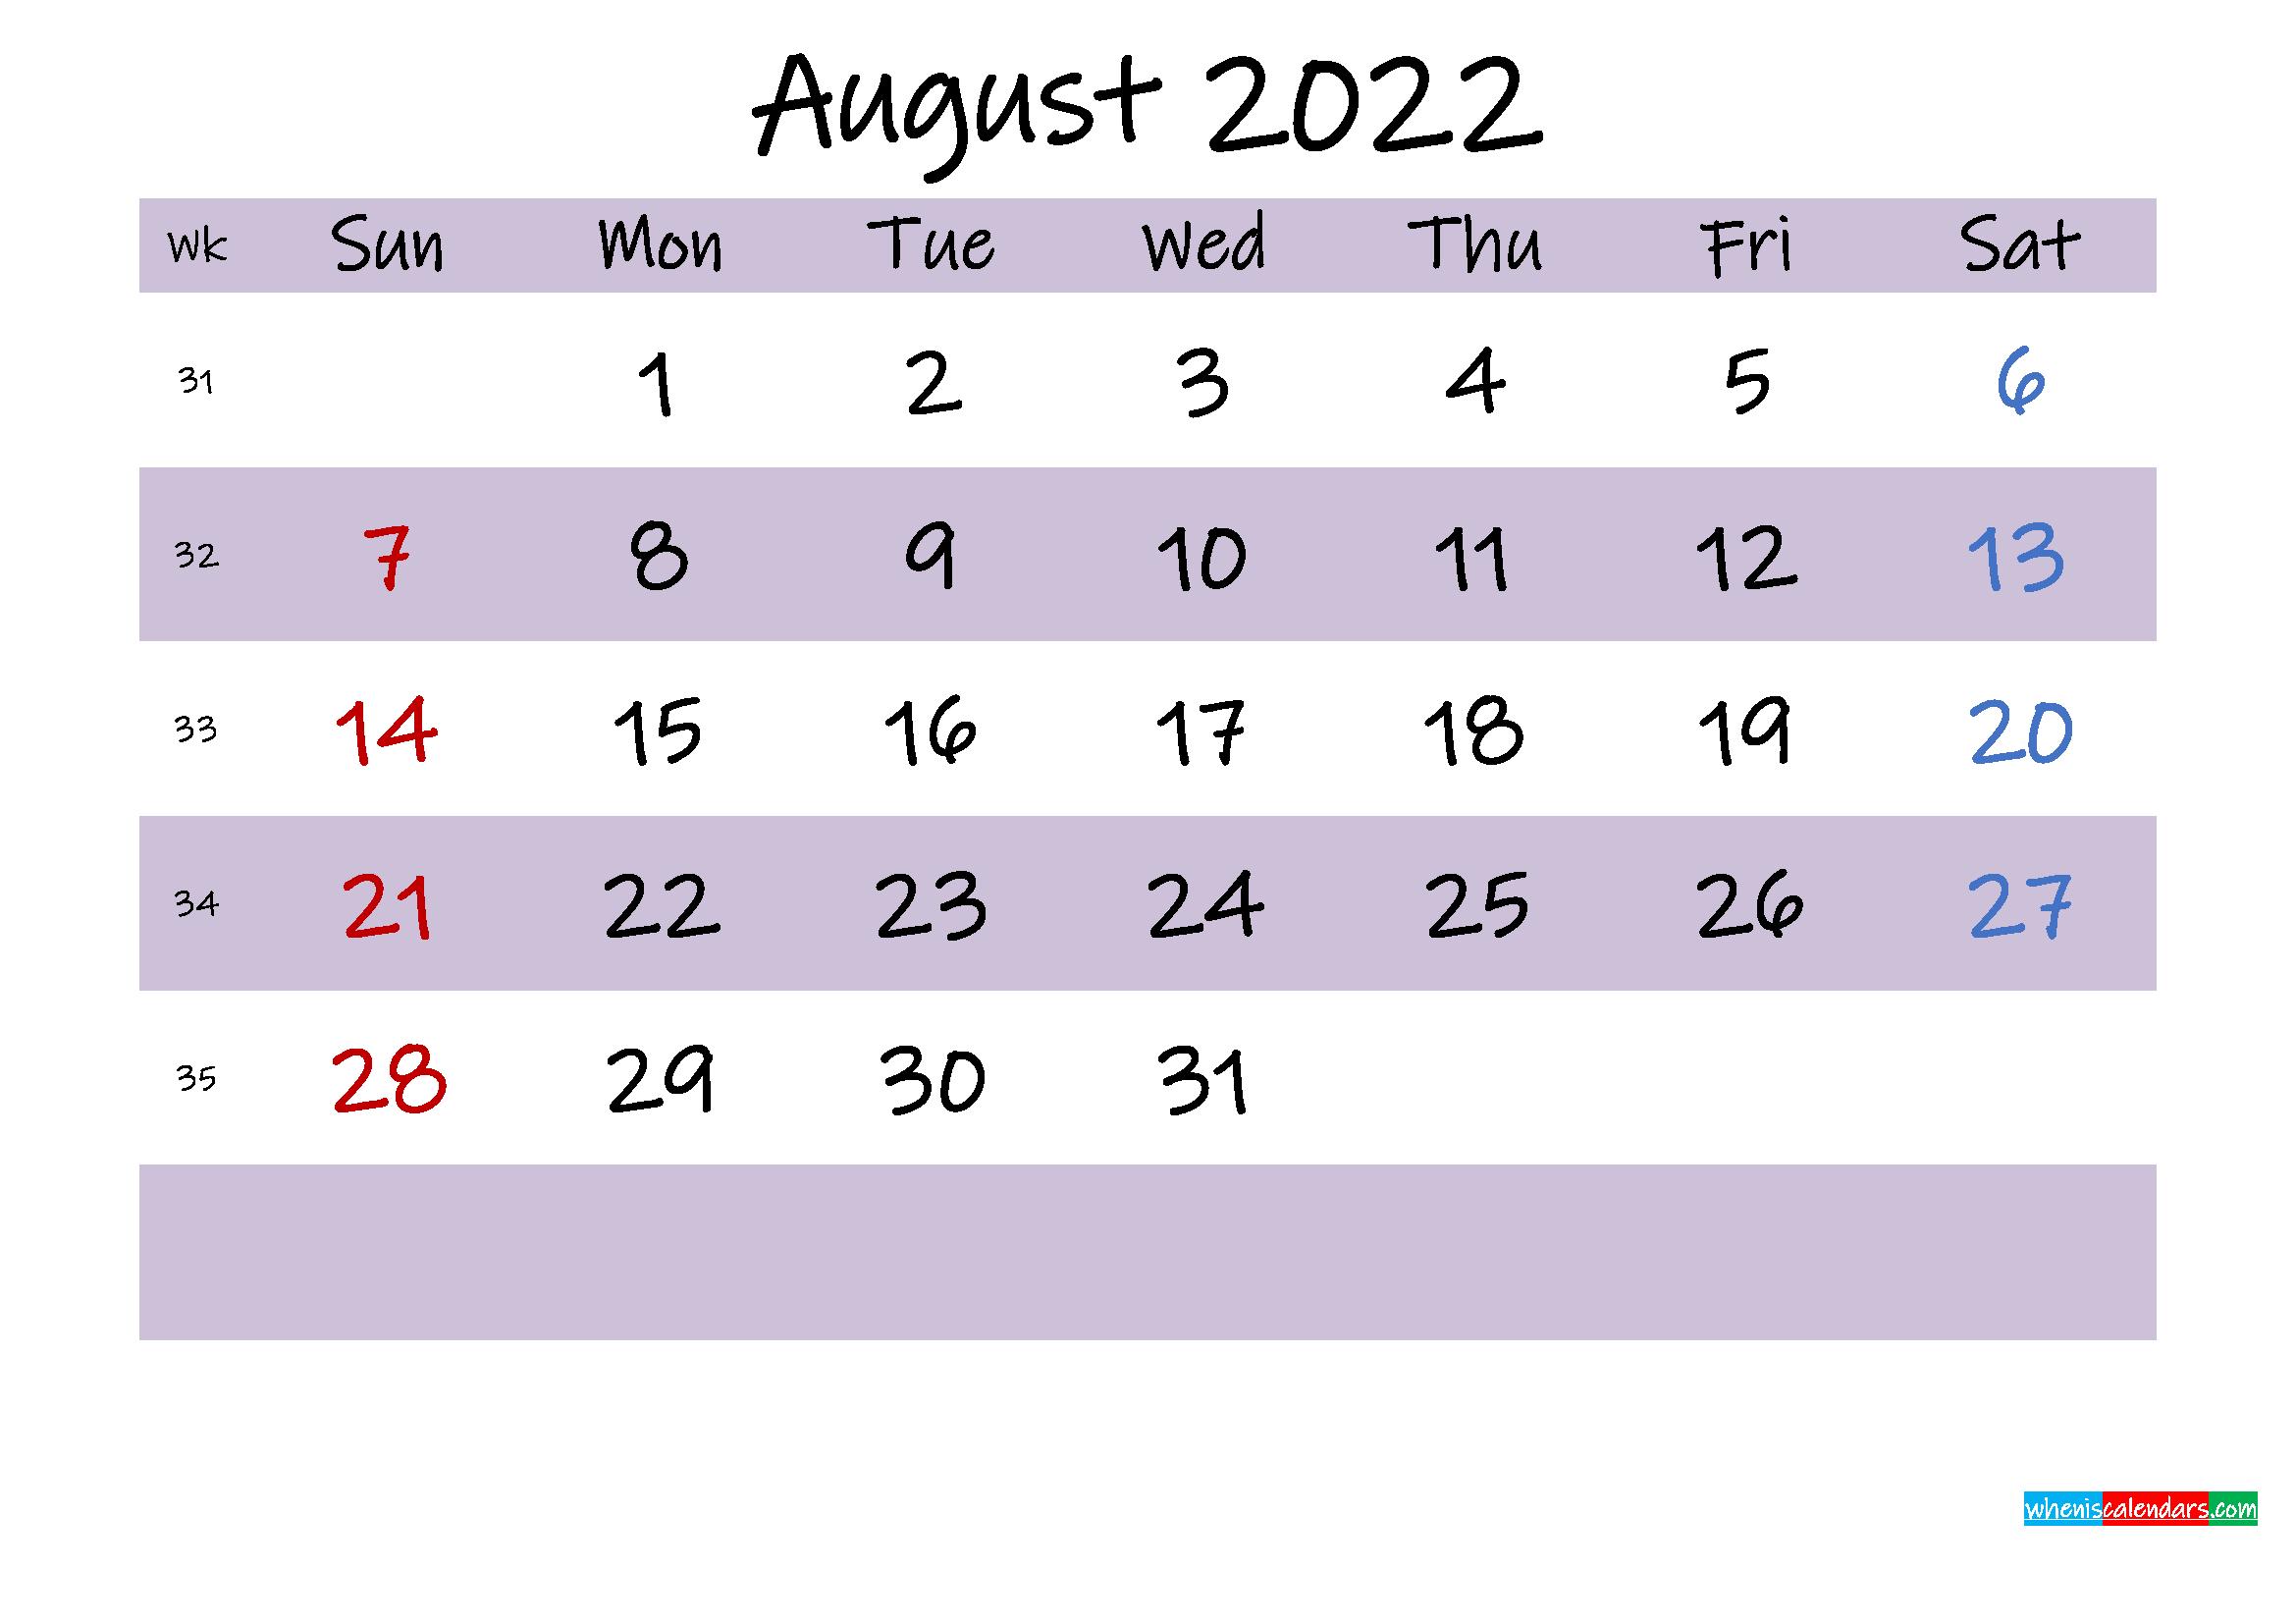 August 2022 Calendar With Holidays Printable - Template No for Printable 2022 August Calendar Photo